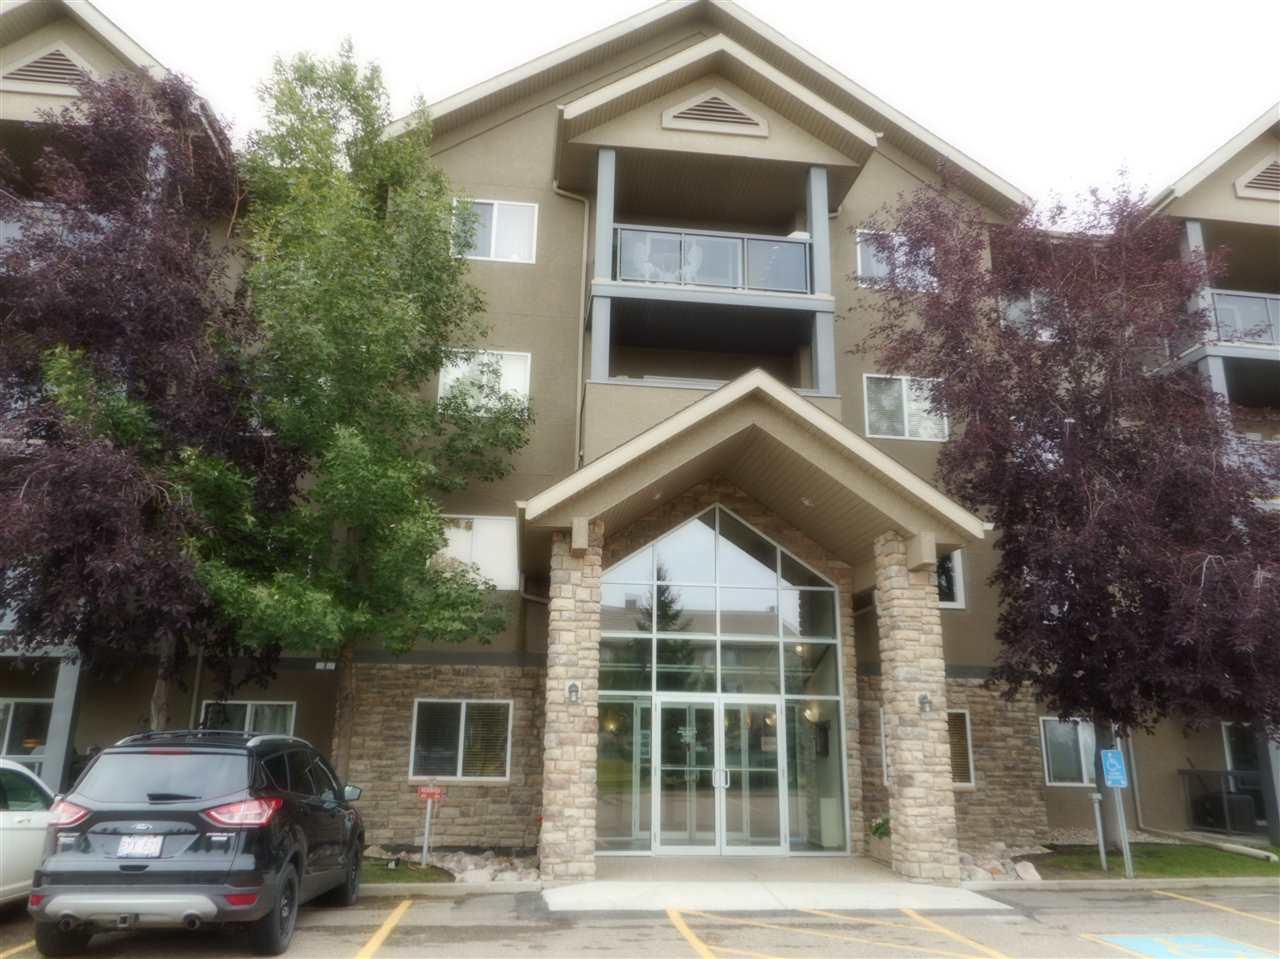 434 279 Suder Greens Drive, Edmonton, MLS® # E4126894